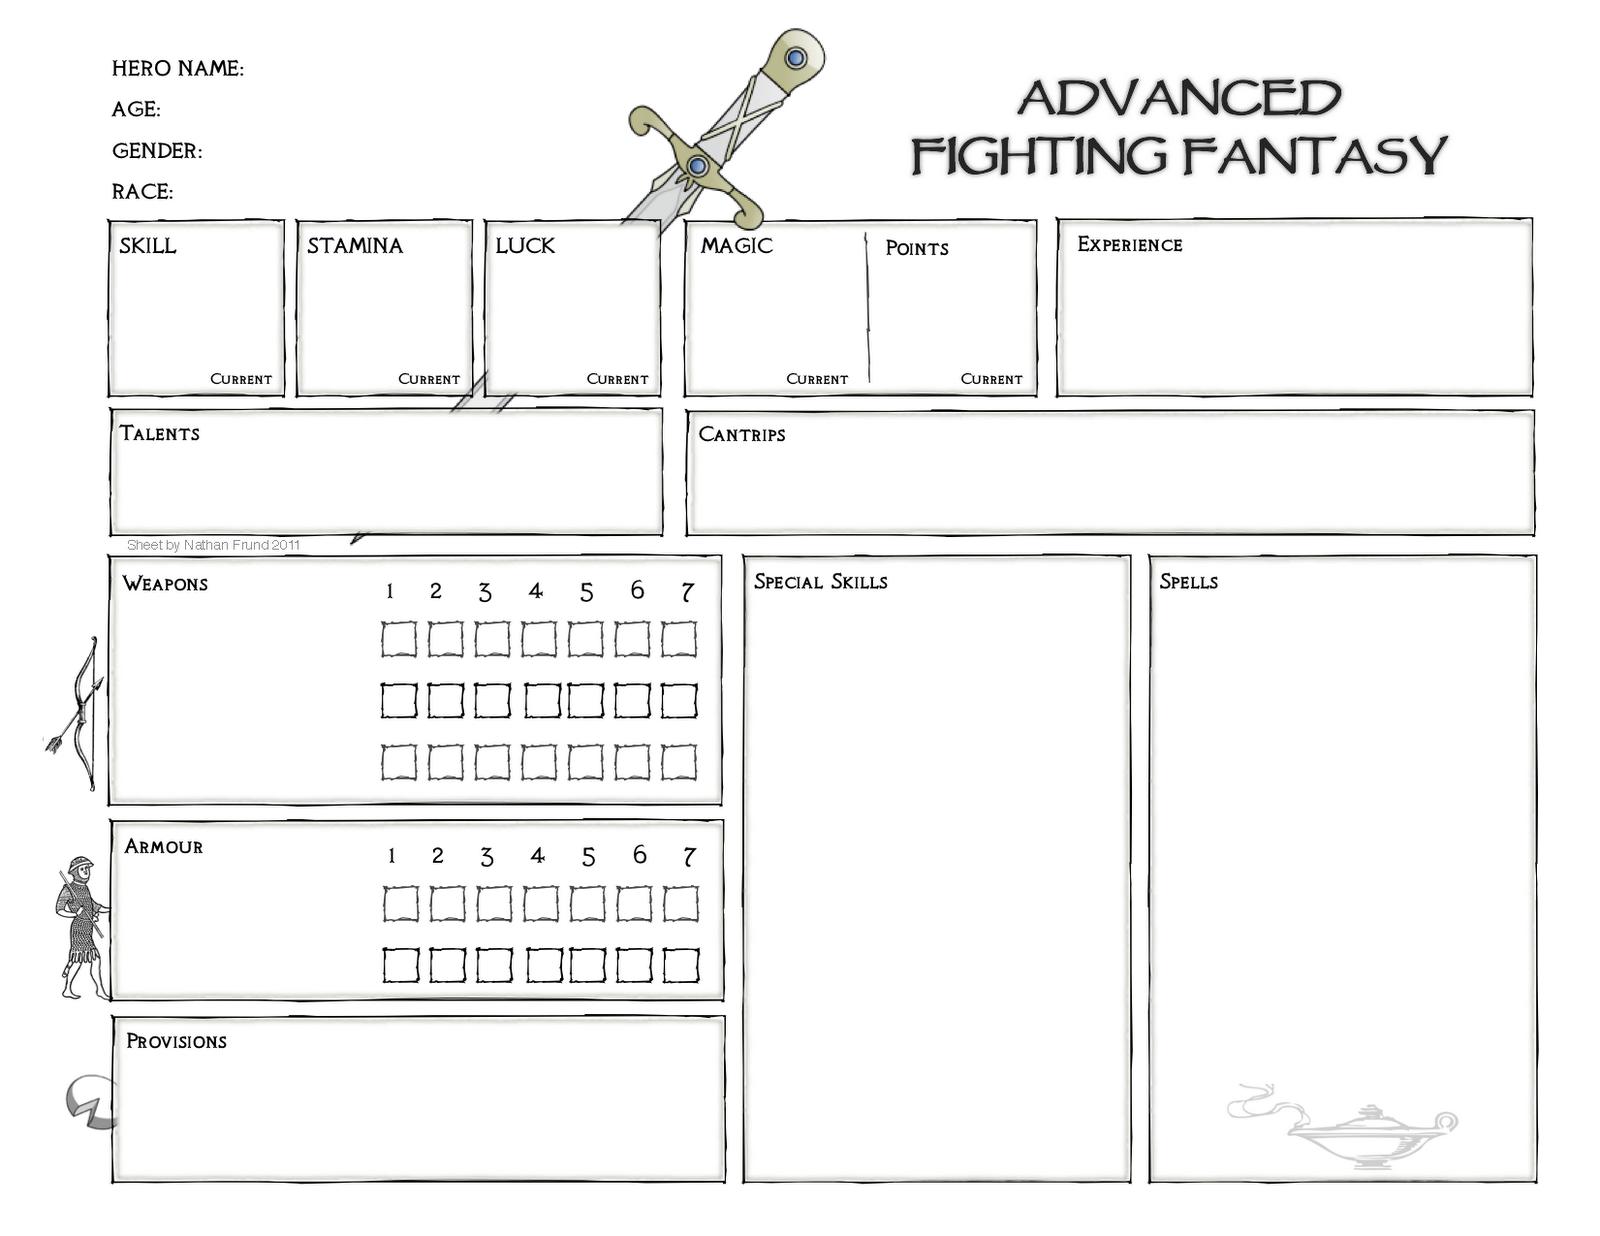 Fantasy Character Design Sheet : Advanced fighting fantasy character sheet platonic solid